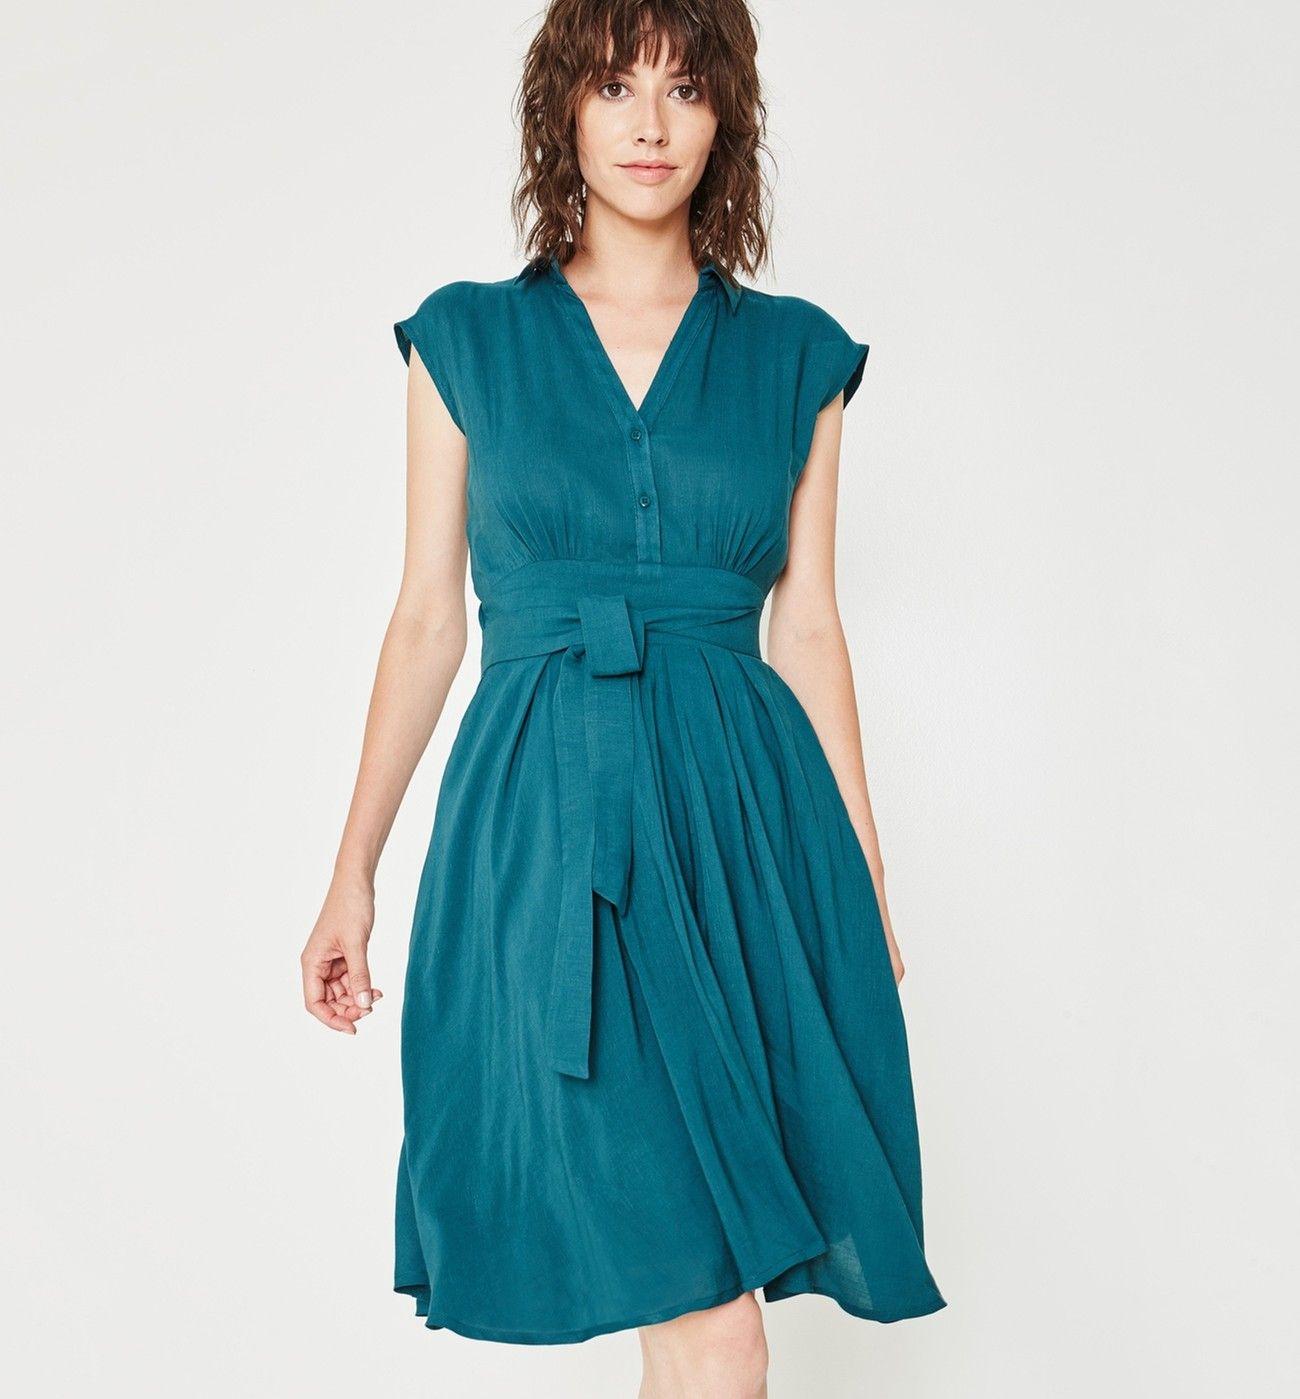 4144fc6b616 Robe ceinturée Femme - Vert émeraude - Robes - Femme - Promod ...